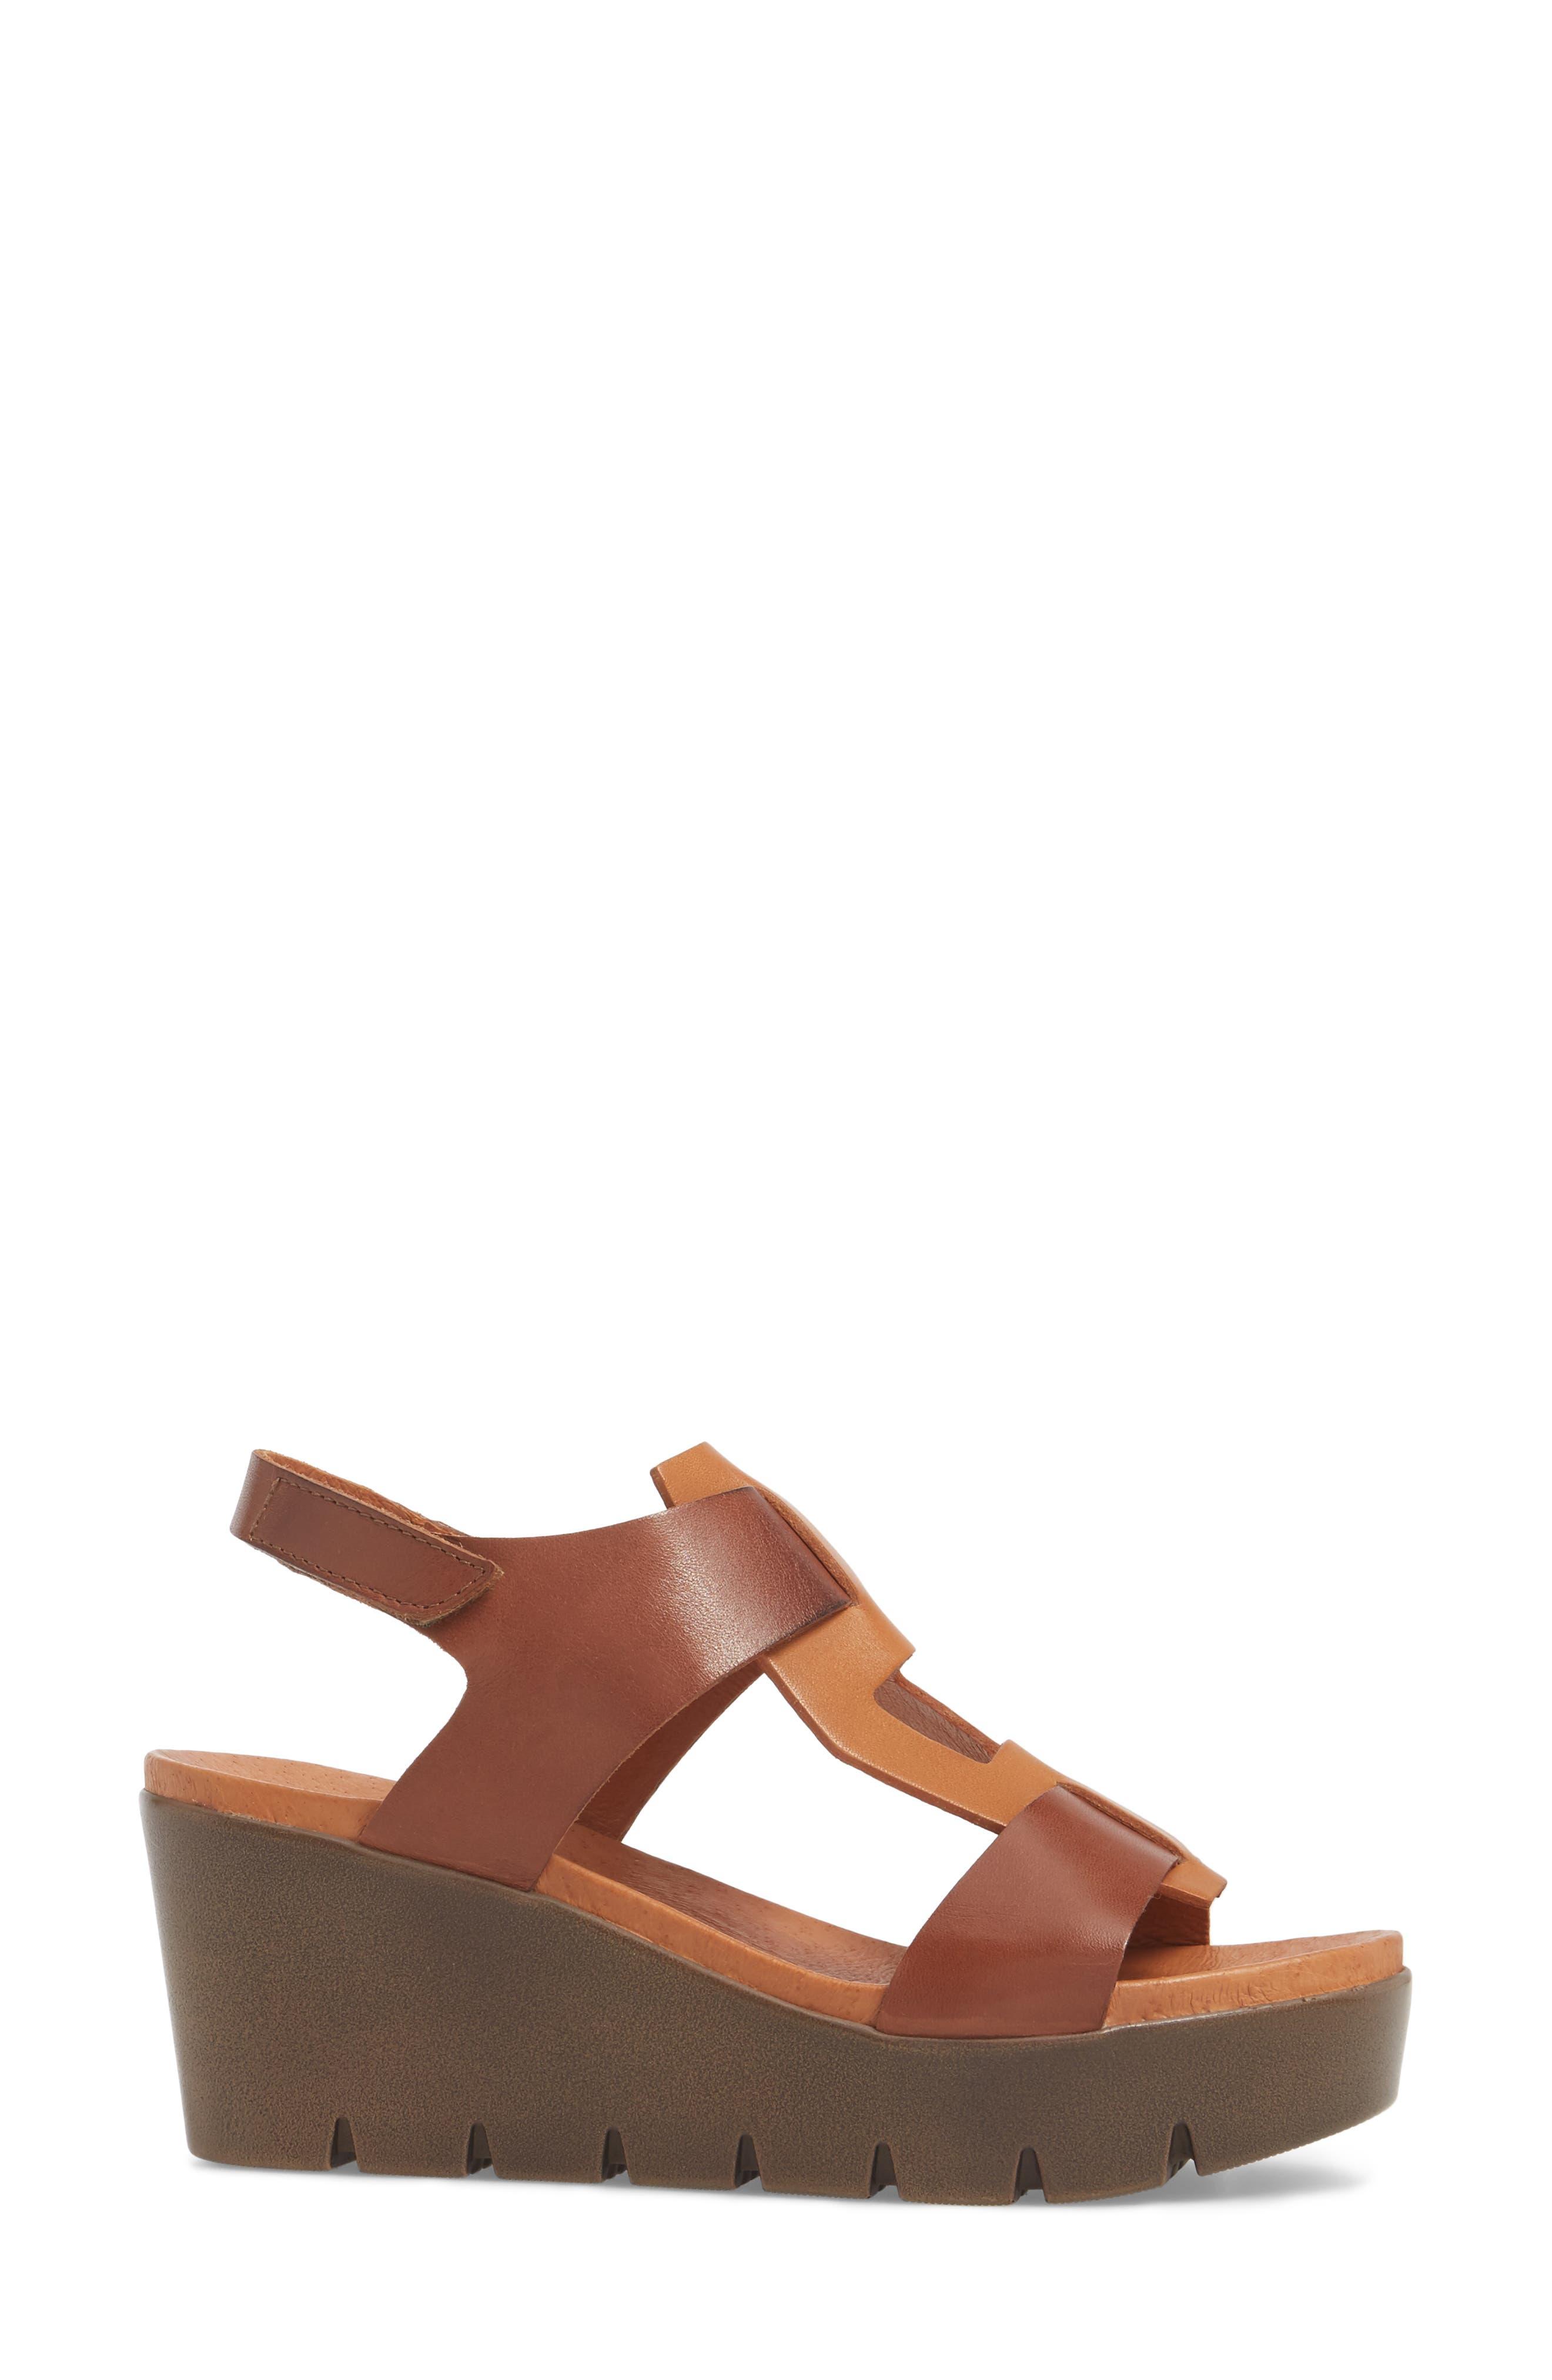 Somo Platform Wedge Sandal,                             Alternate thumbnail 3, color,                             Cognac/ Camel Leather